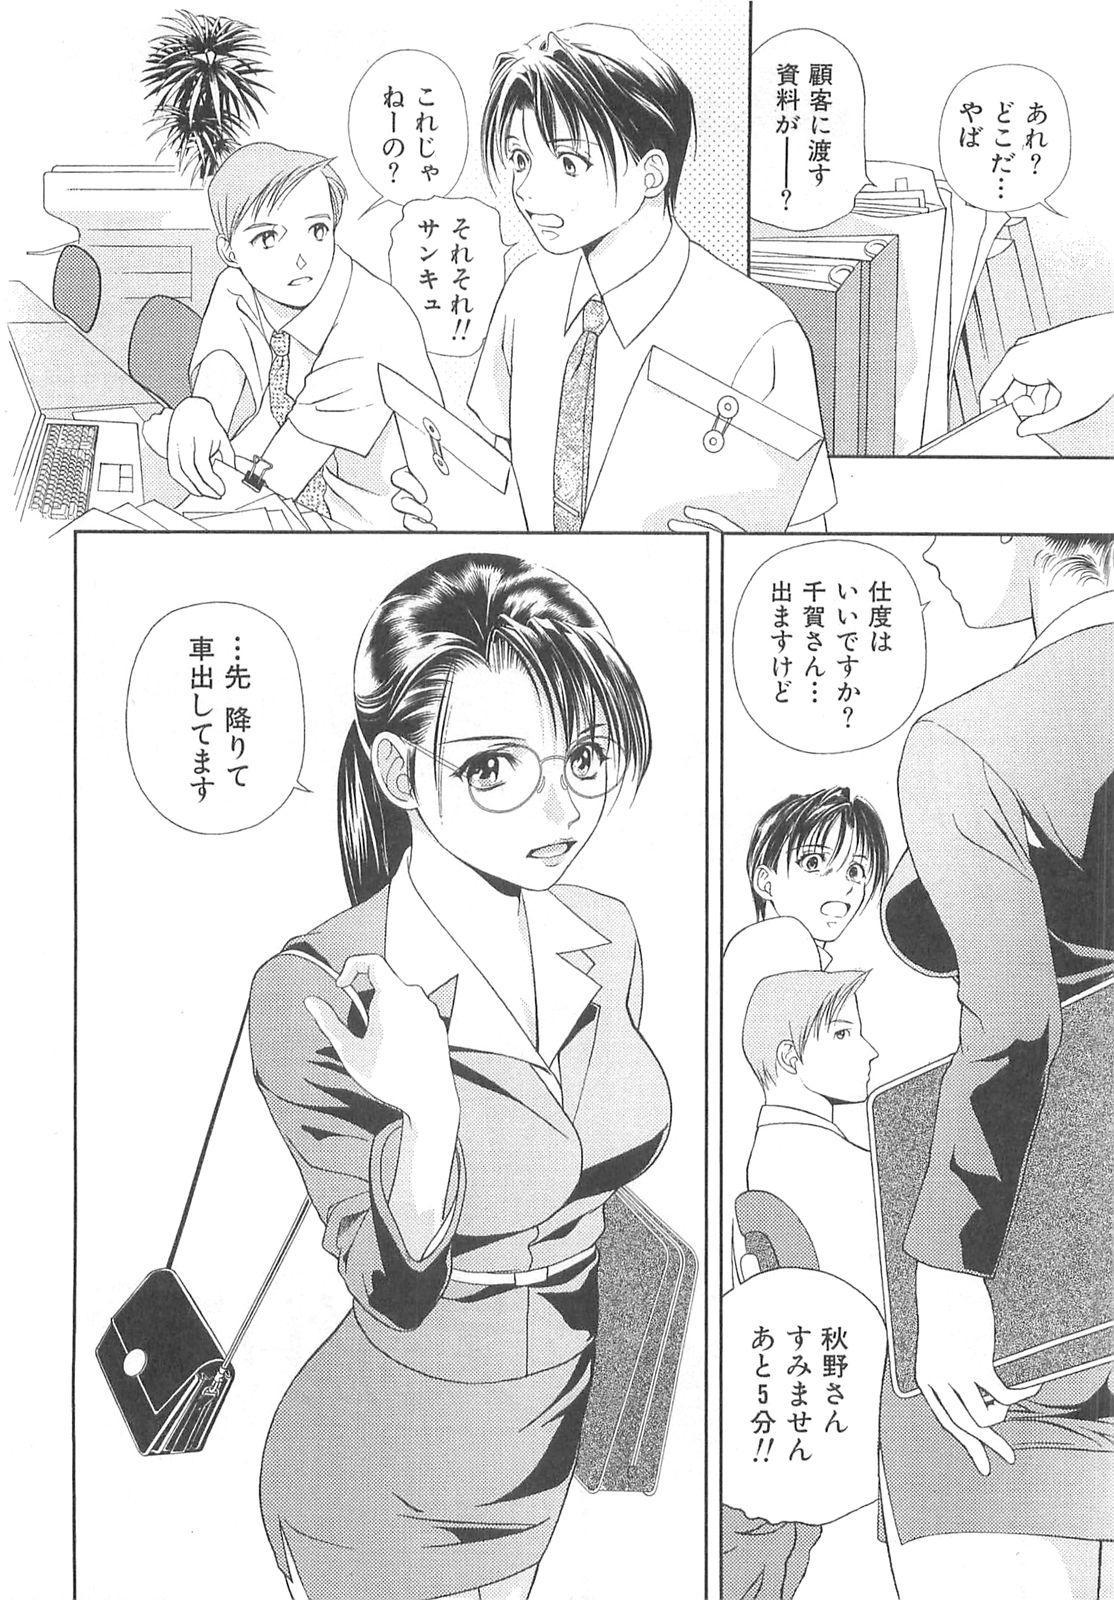 Tenshi no Kyuu - Angel's Pretty Hip 172